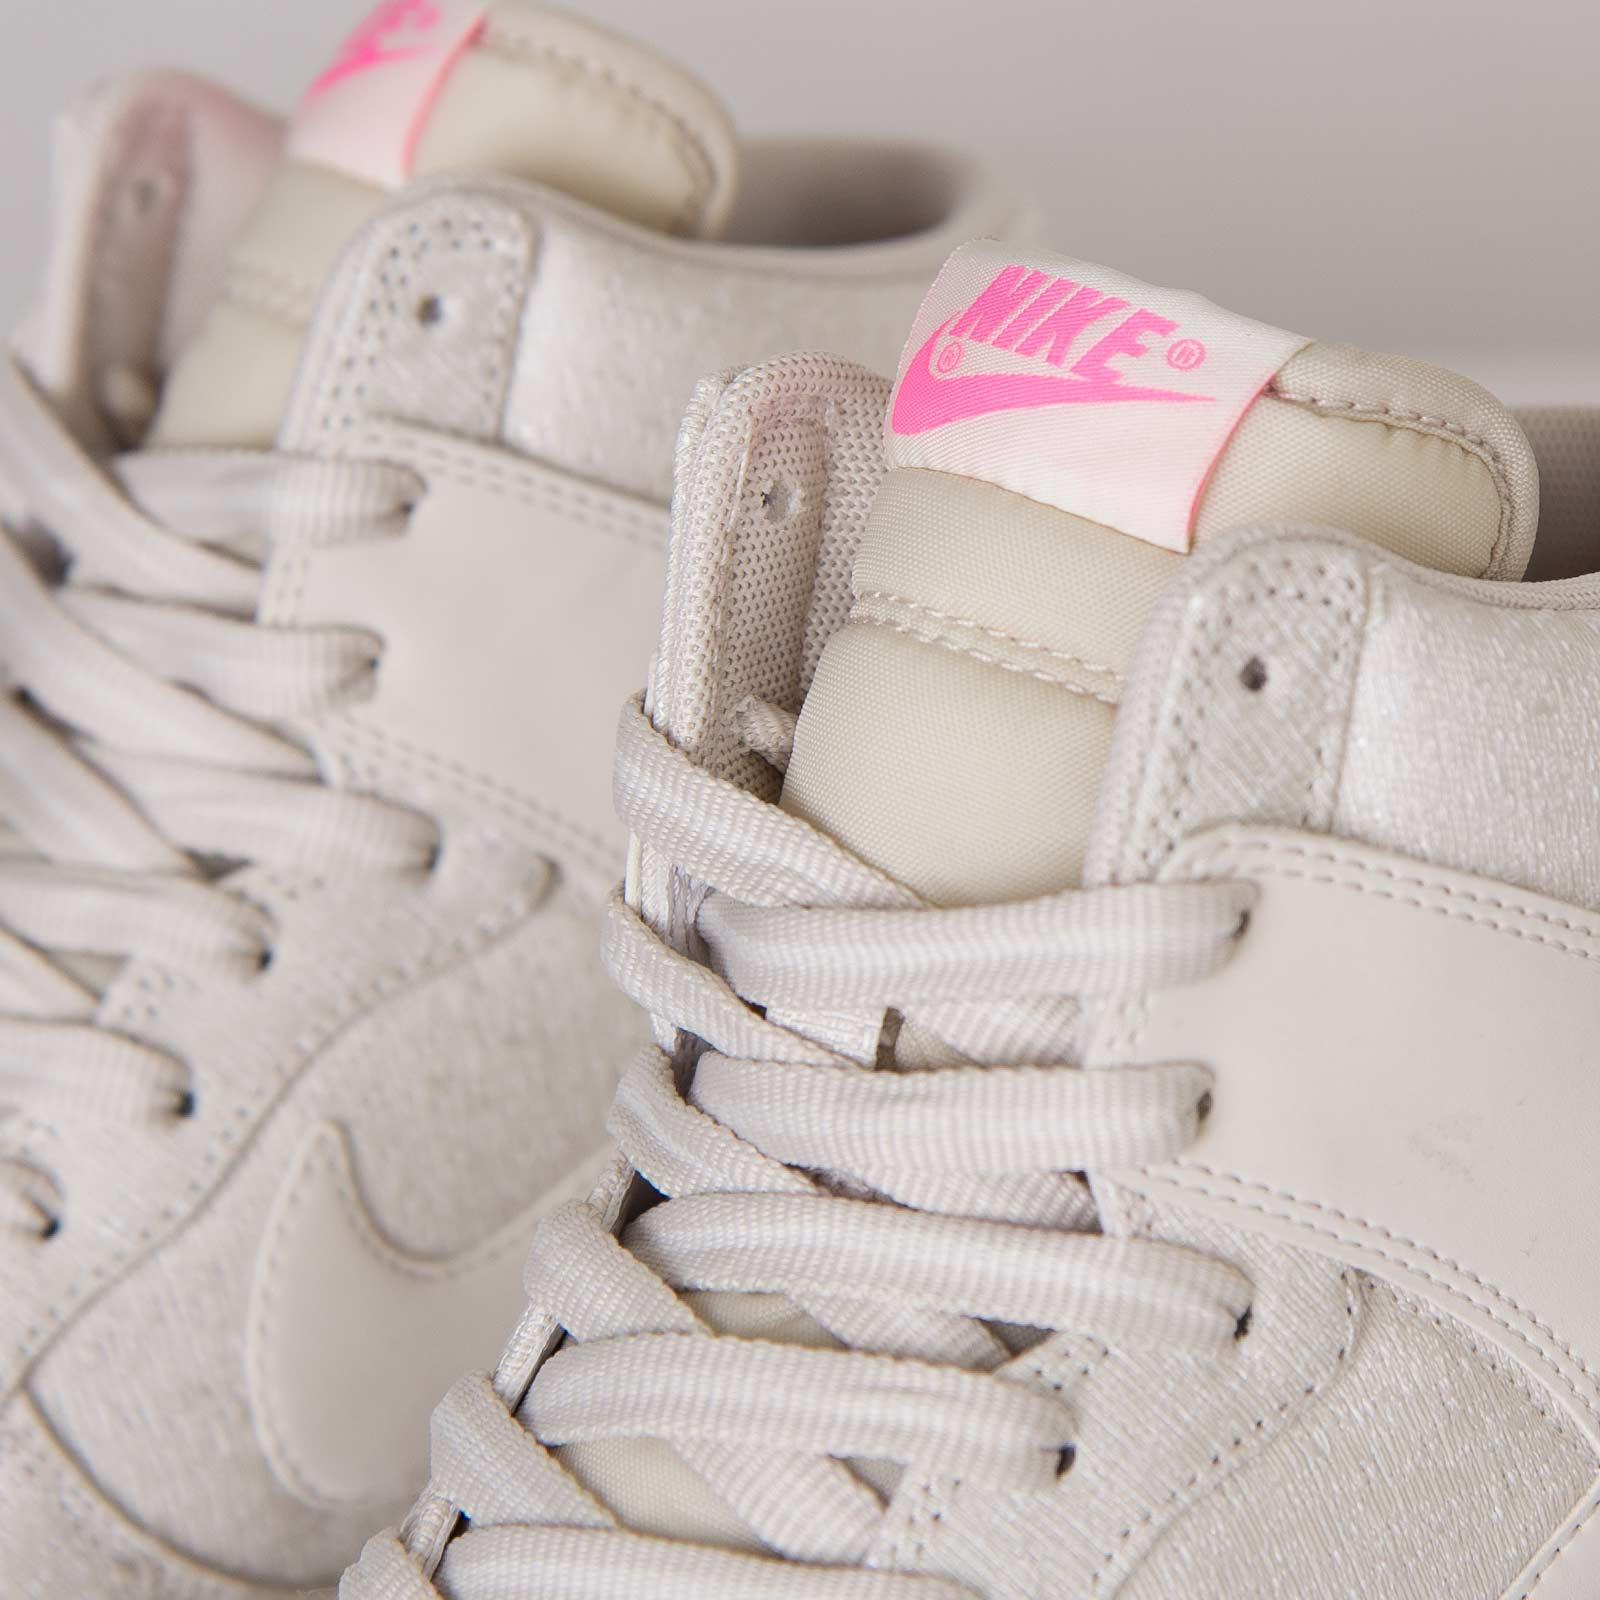 0a3b3928cd3 Nike Wmns Dunk Sky Hi Txt ... Nike Dunk Sky High TXT (Hidden Wedge Heel)  Shoes - Men s Sku 11898 ...